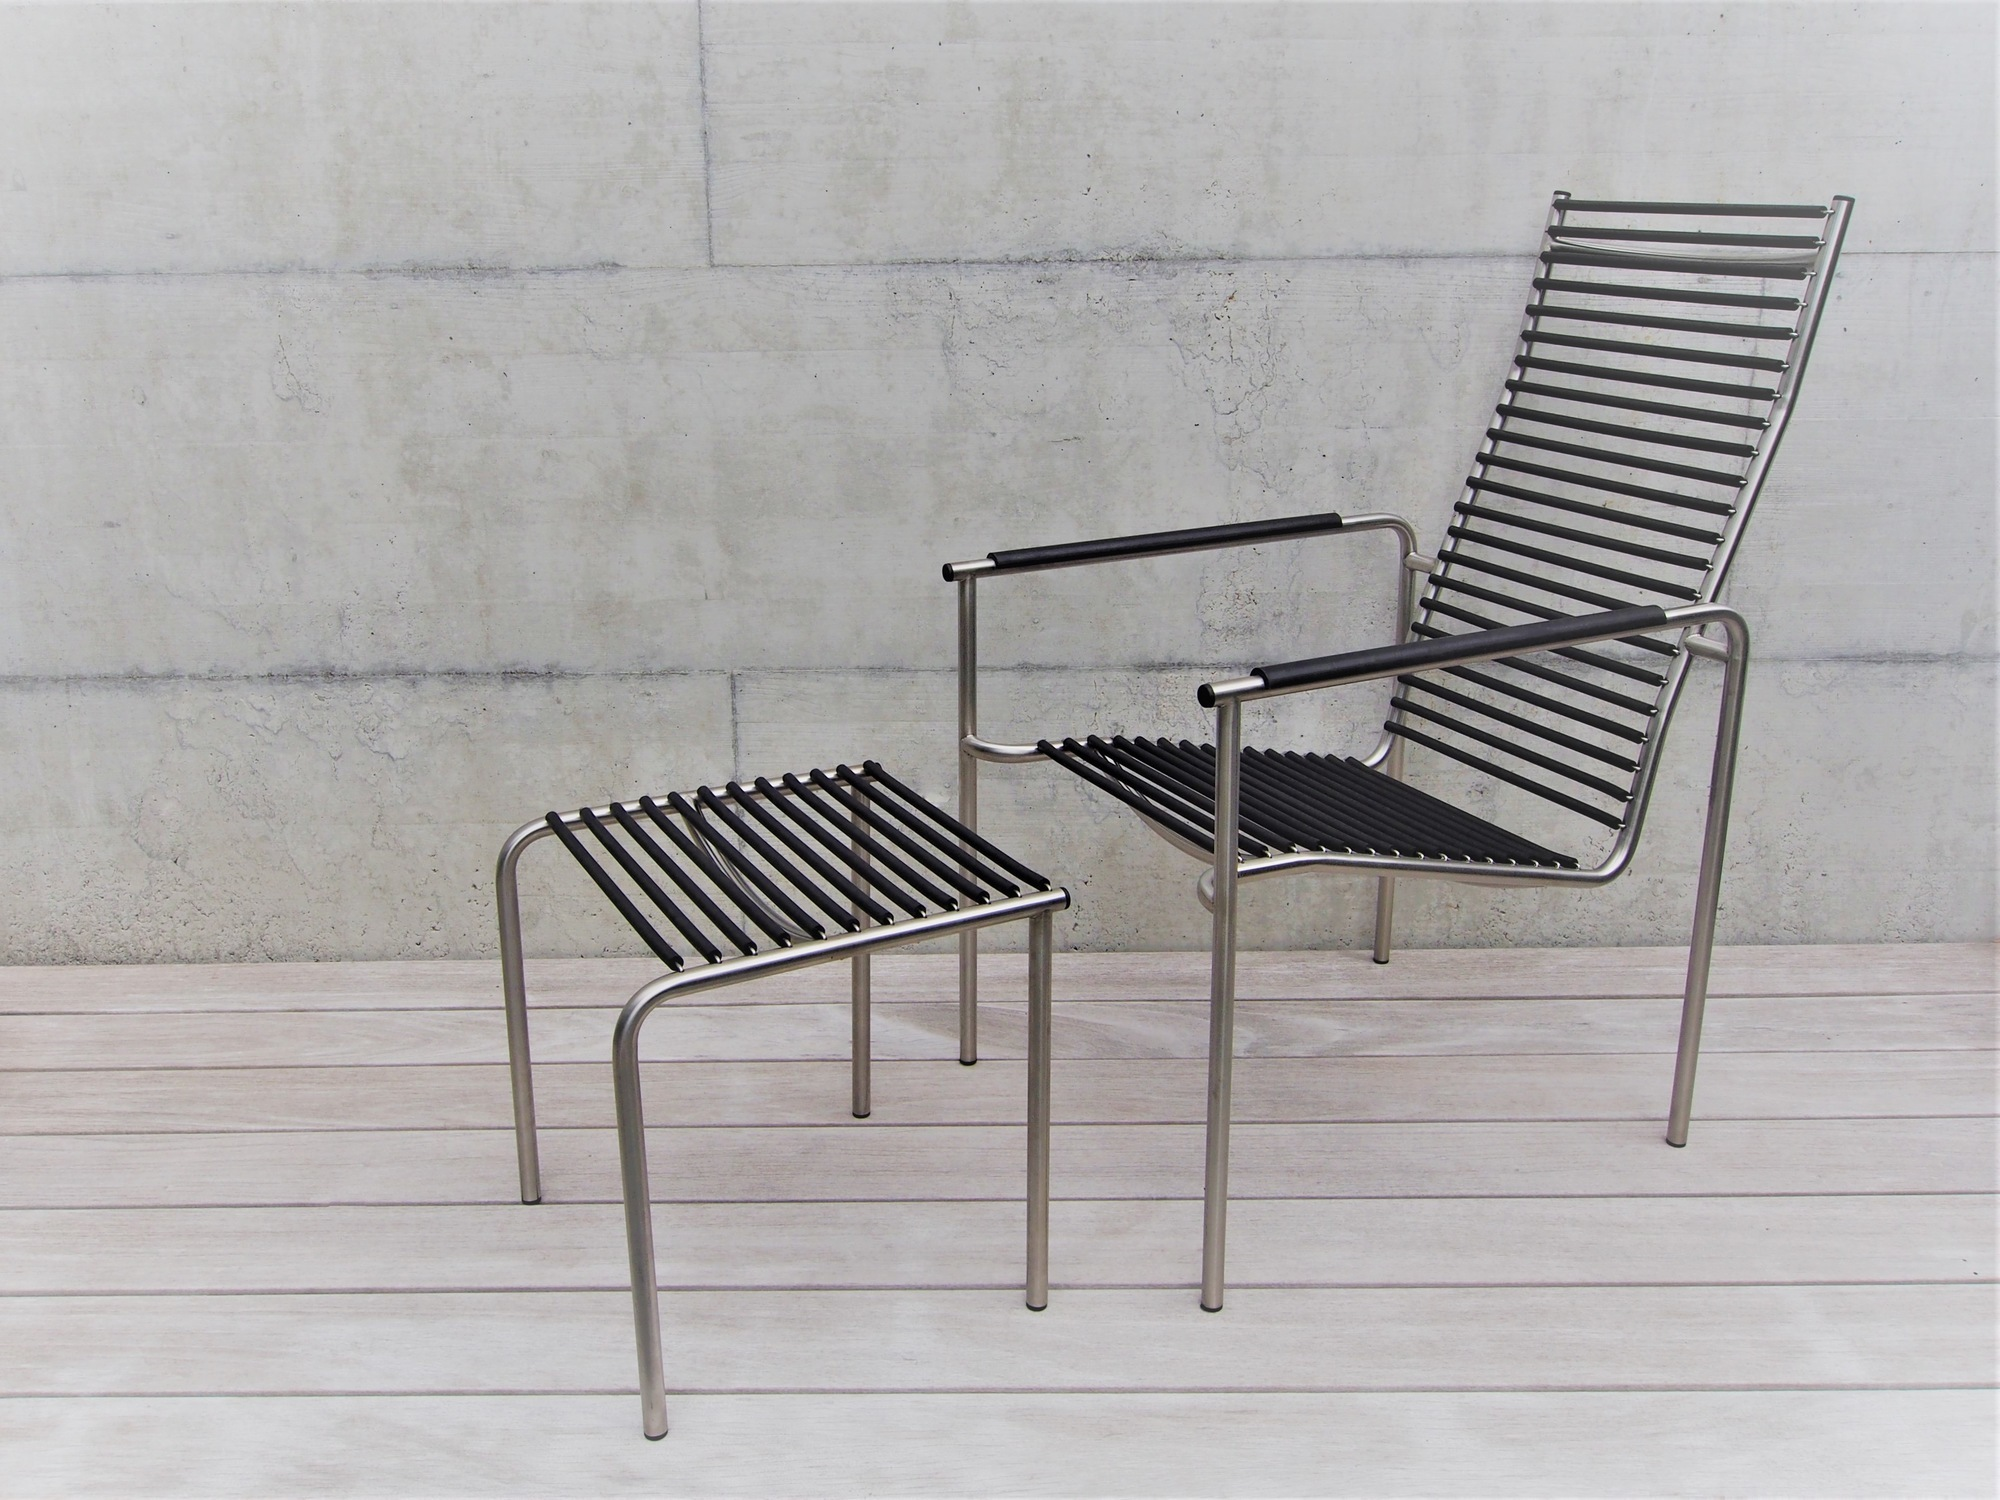 1531834168-gartenmoebel-clone-fauteuil-julia_2.jpg